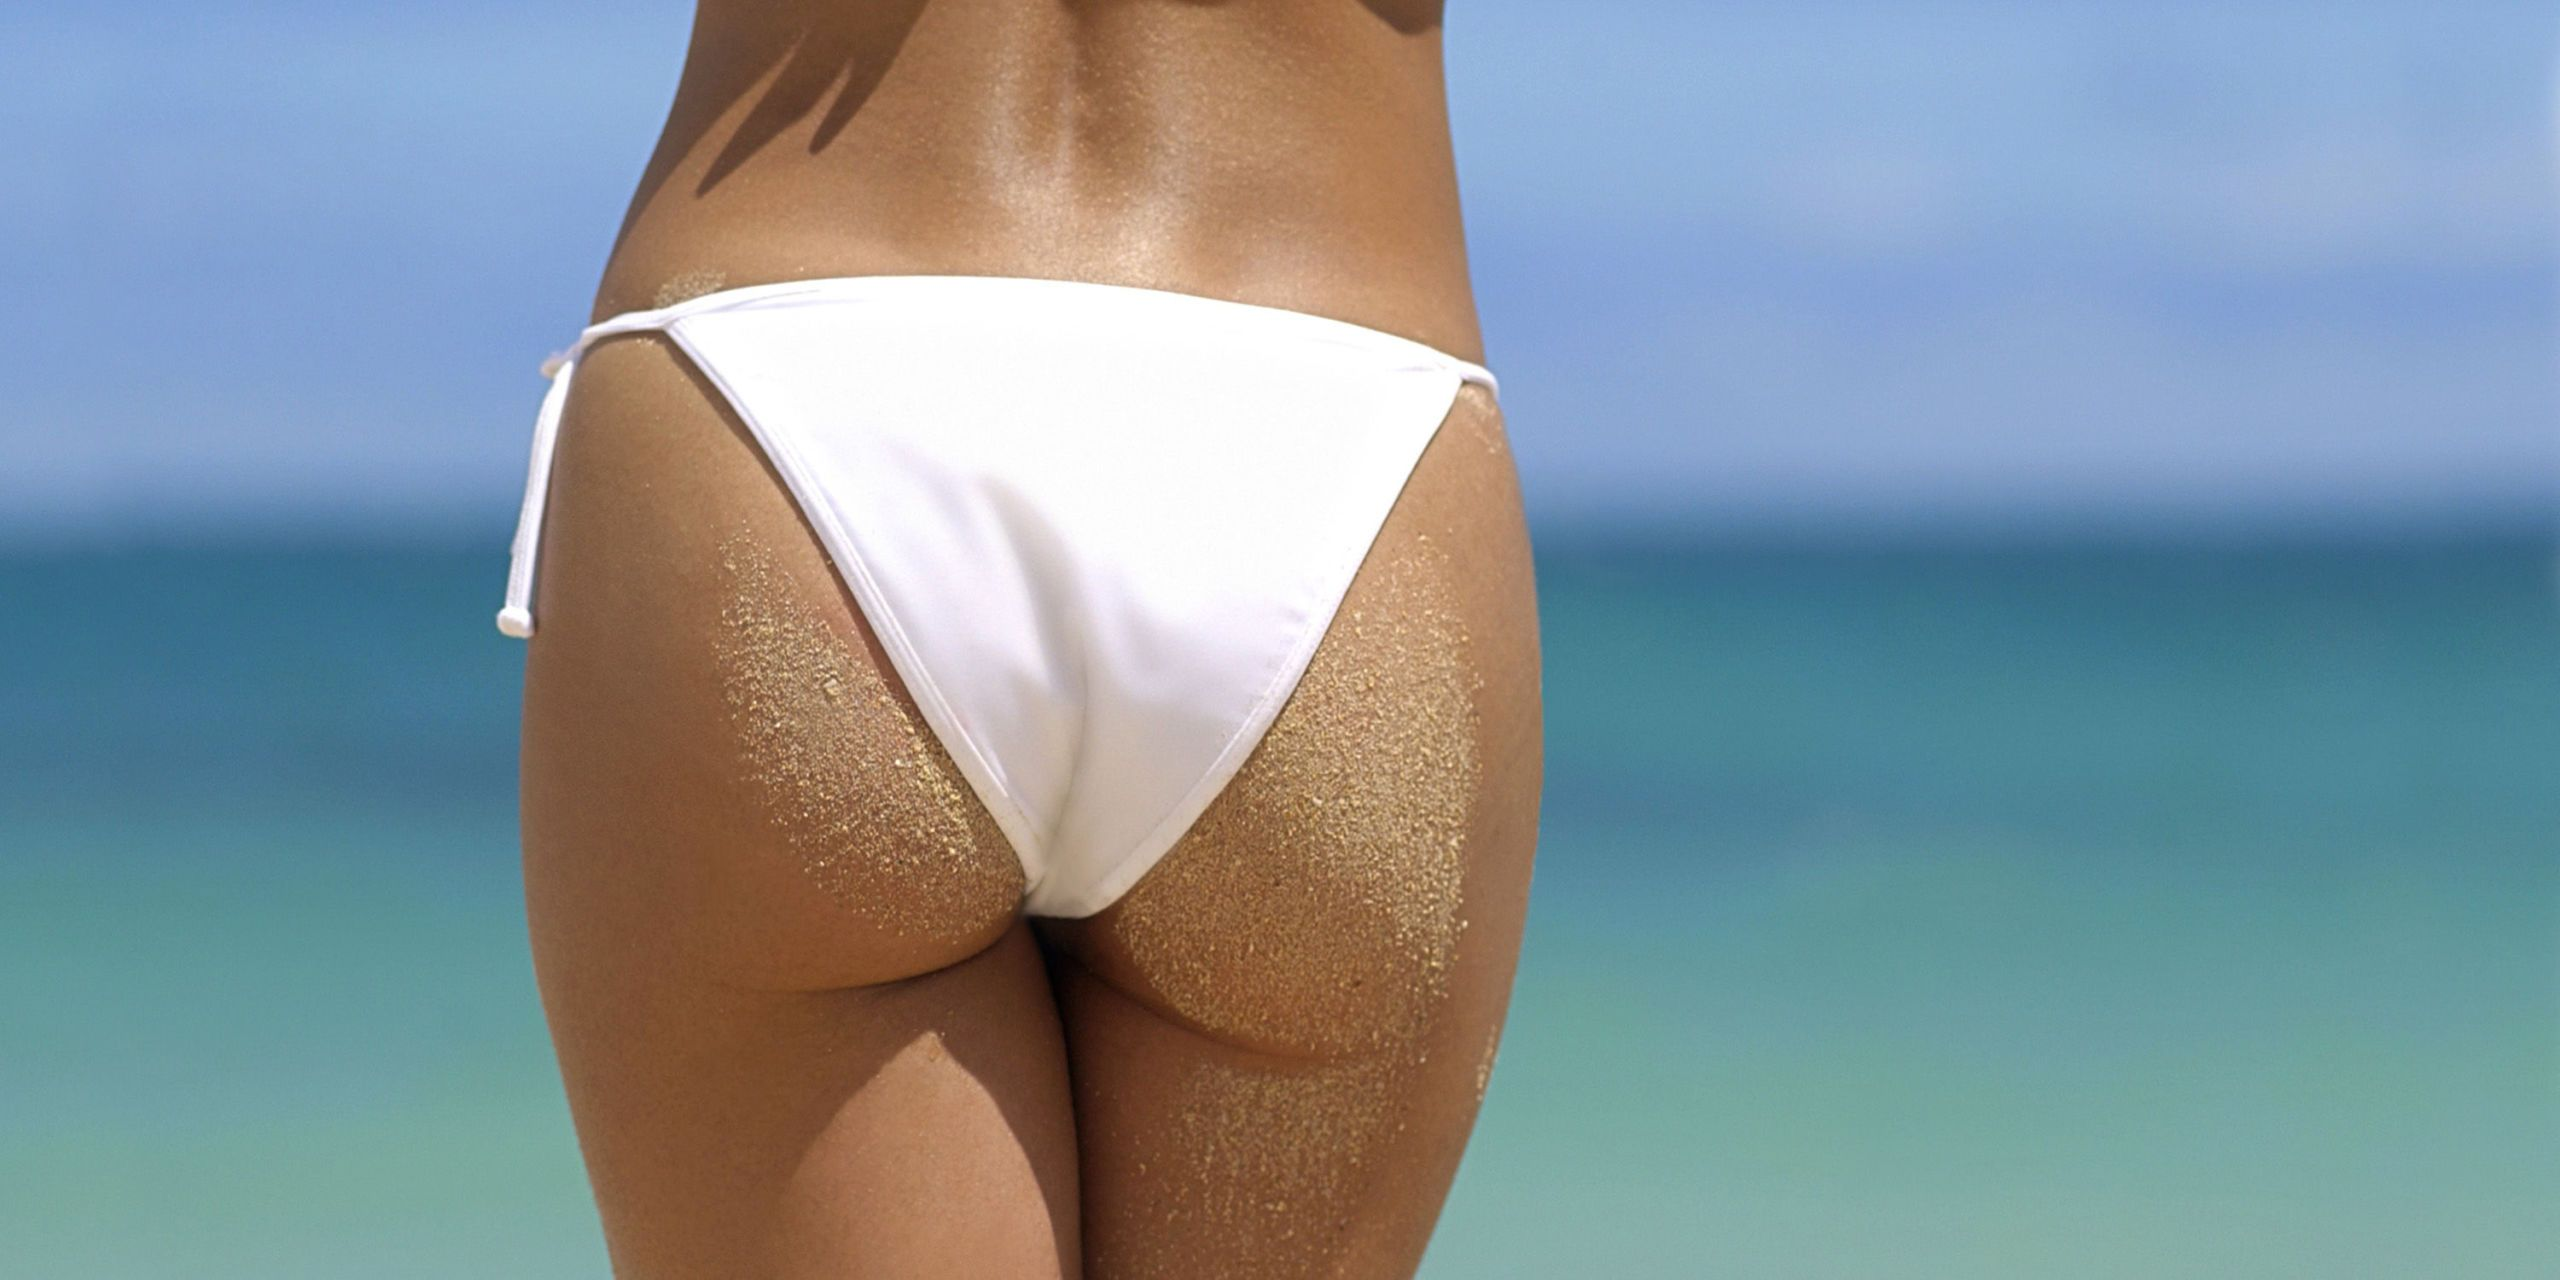 Ass bikini butt community tanning type